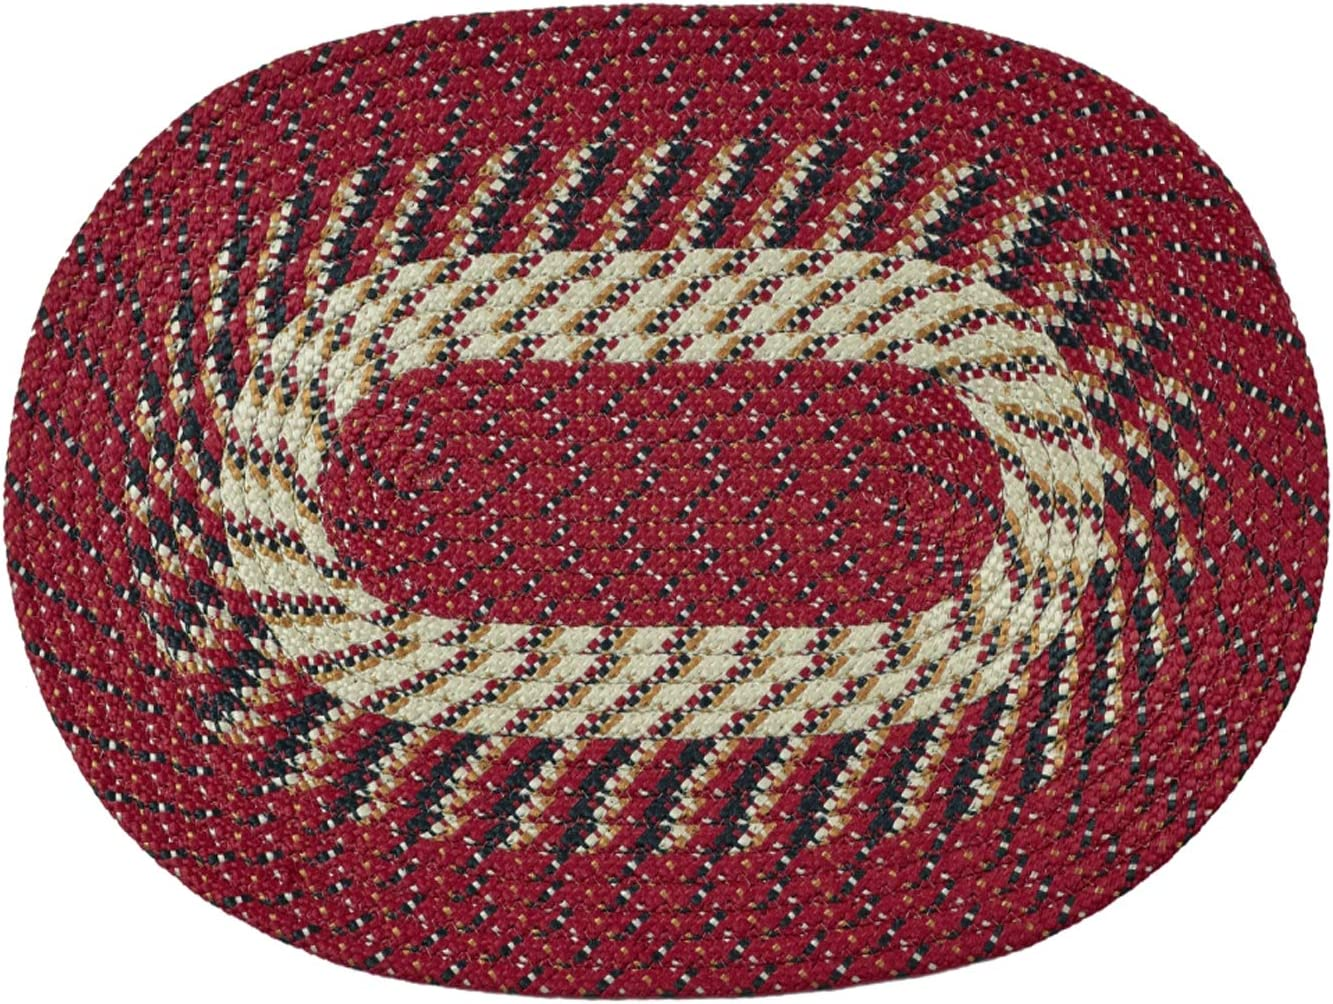 Country Braid Stripe Rug Black, 30x50